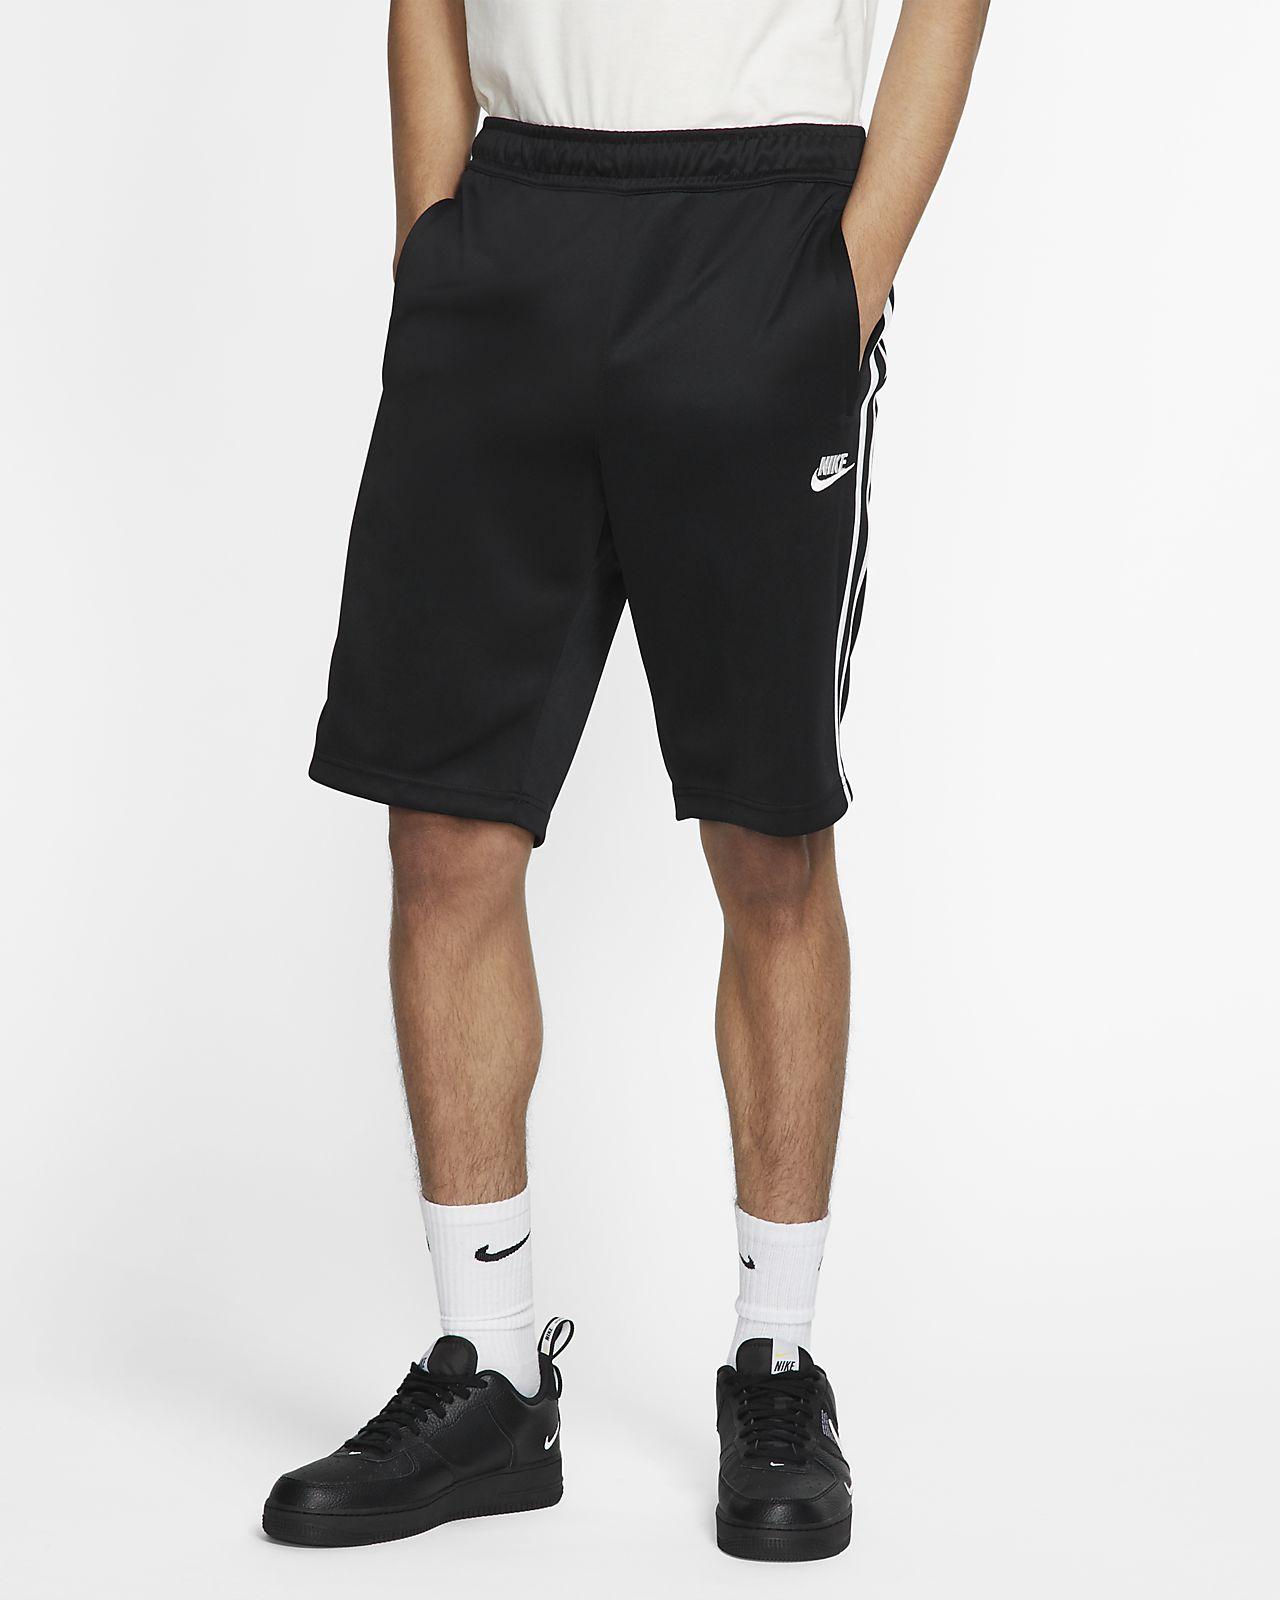 Shorts para hombre Nike Sportswear